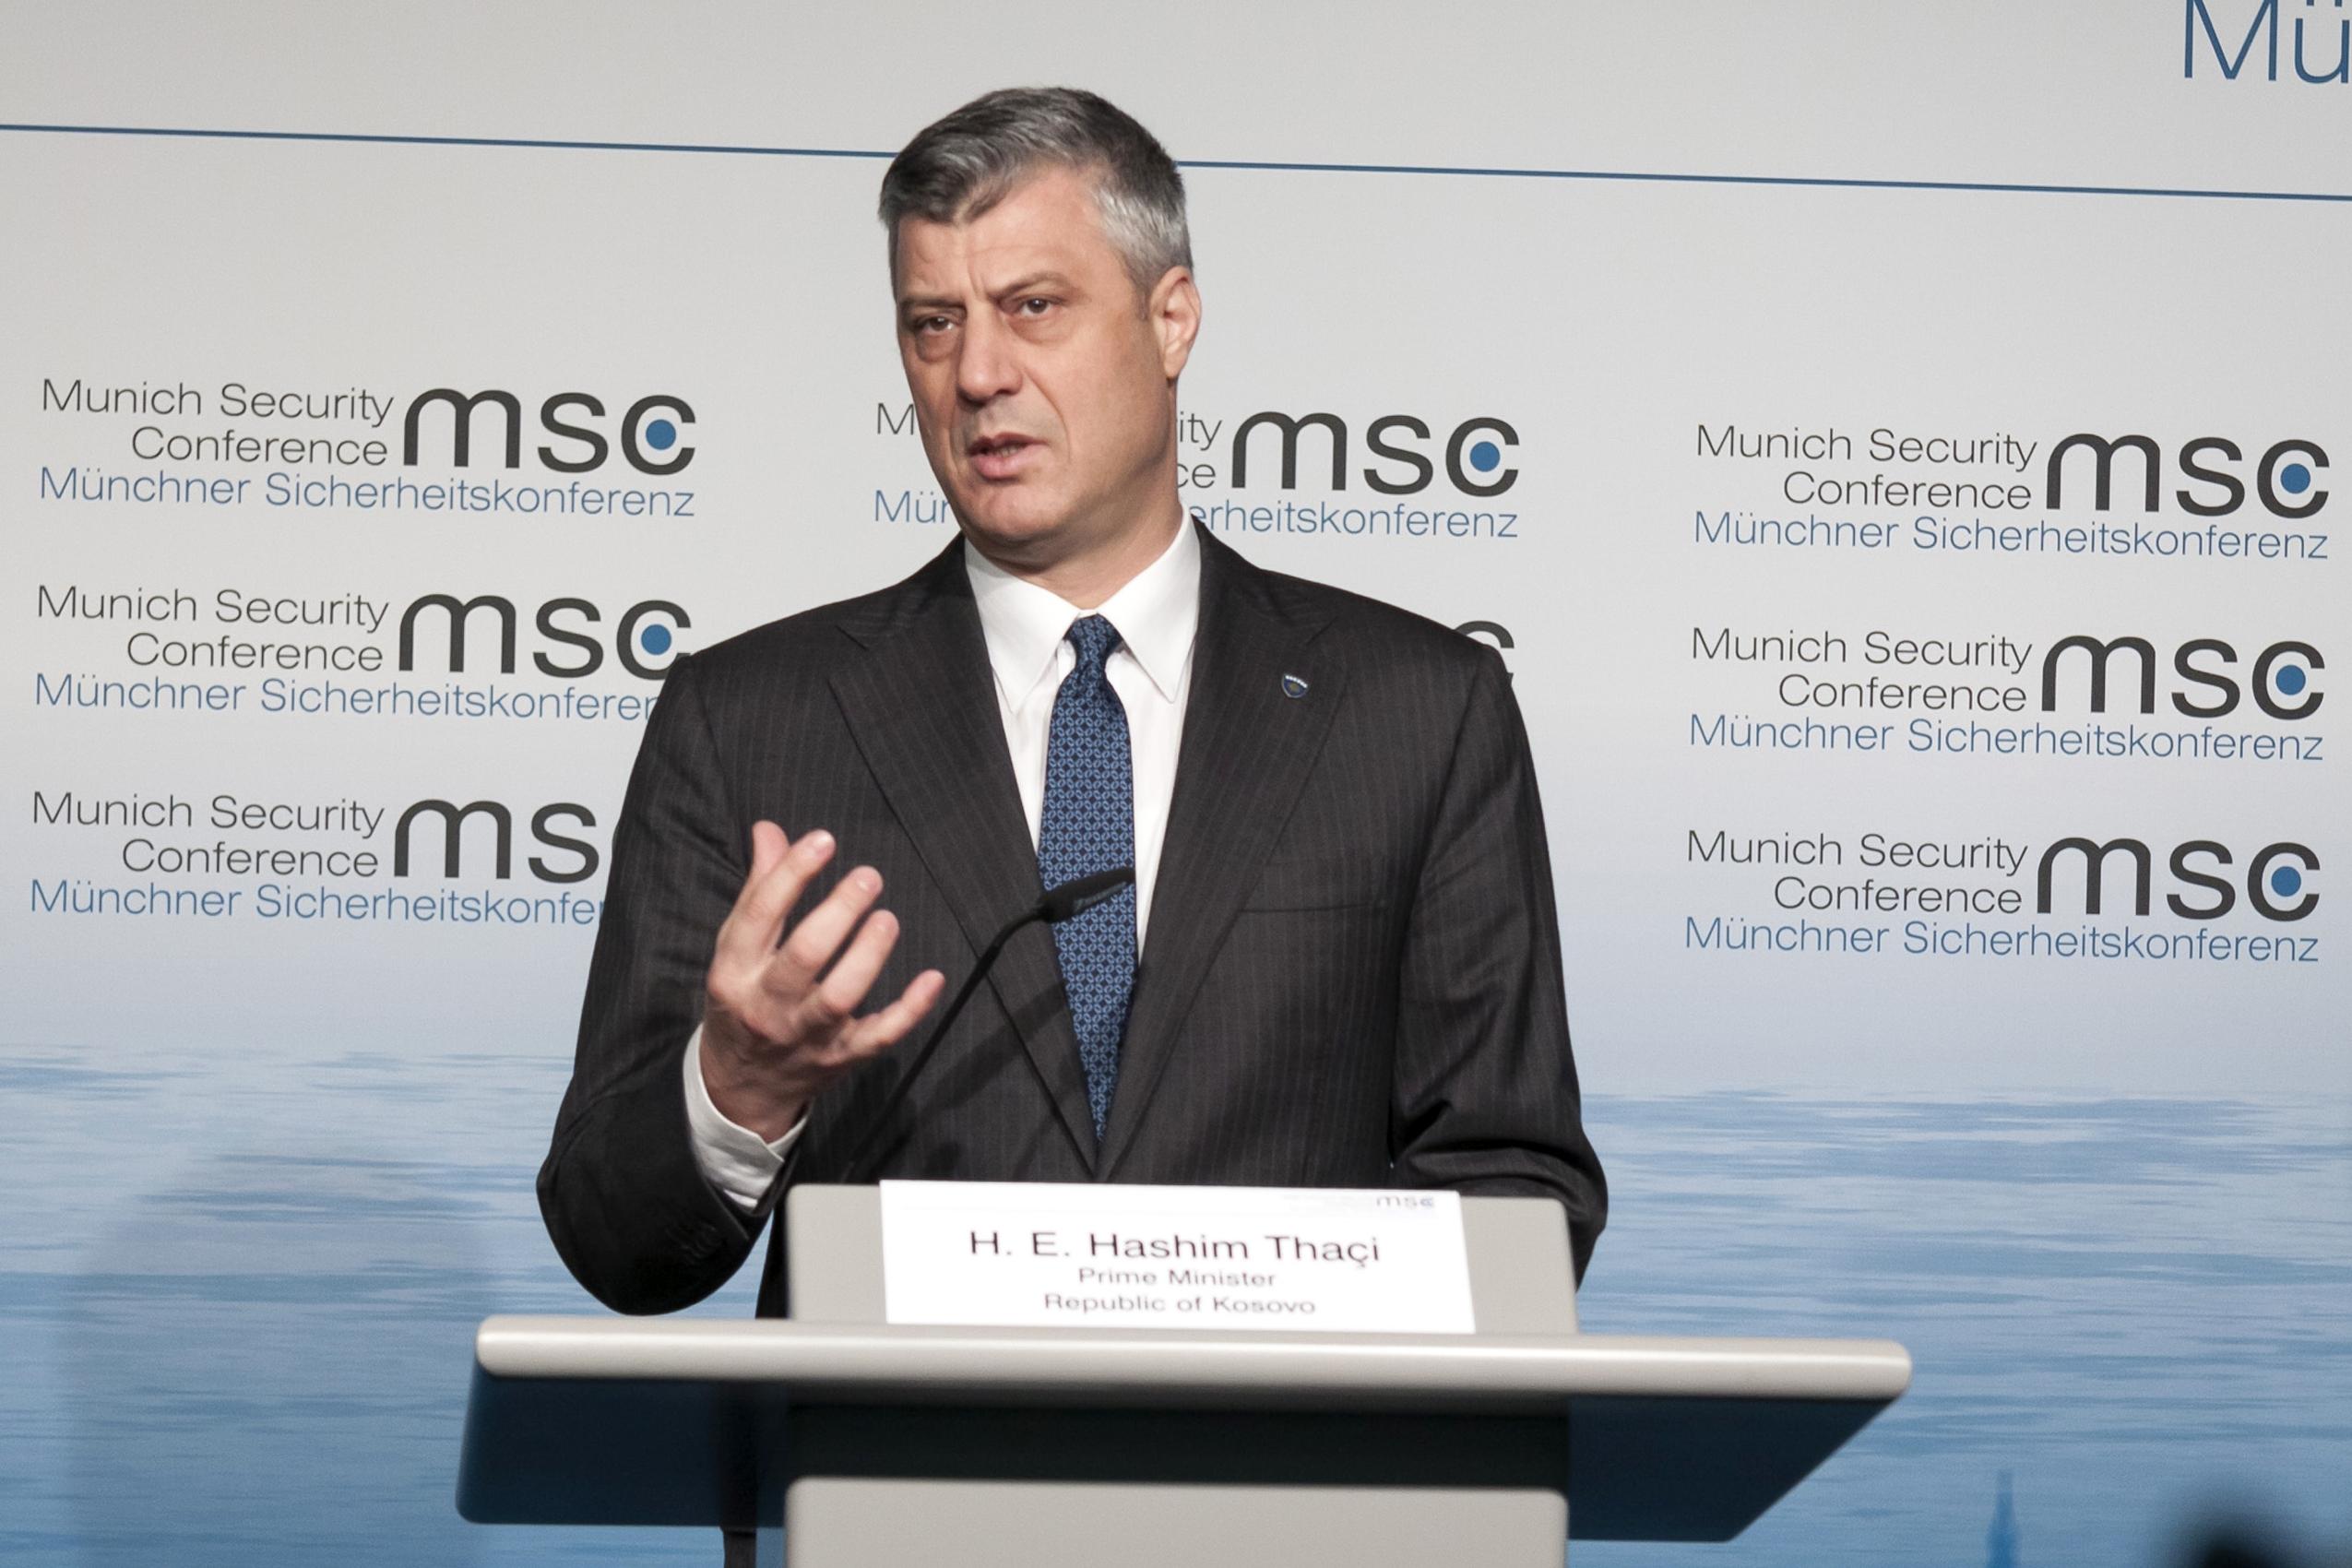 Hashim Thaci Biography Hashim Thaçi Aus Wikipedia